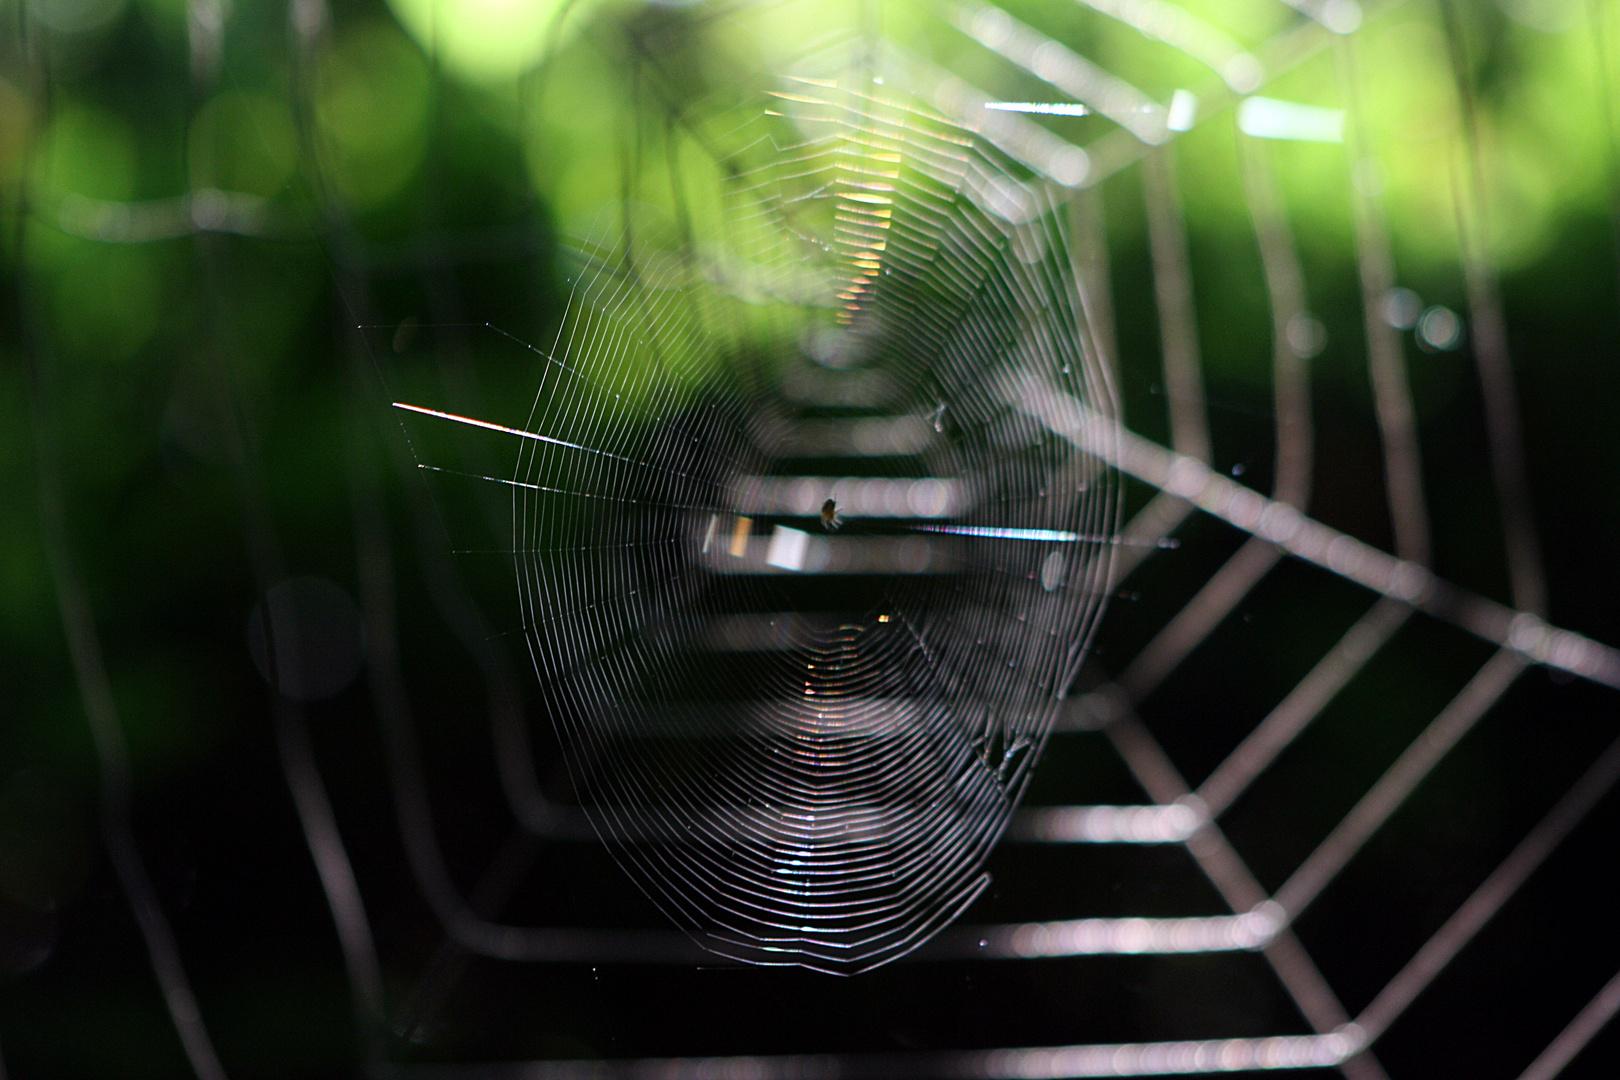 Wenn hinter Spinnen Spinnen spinnen